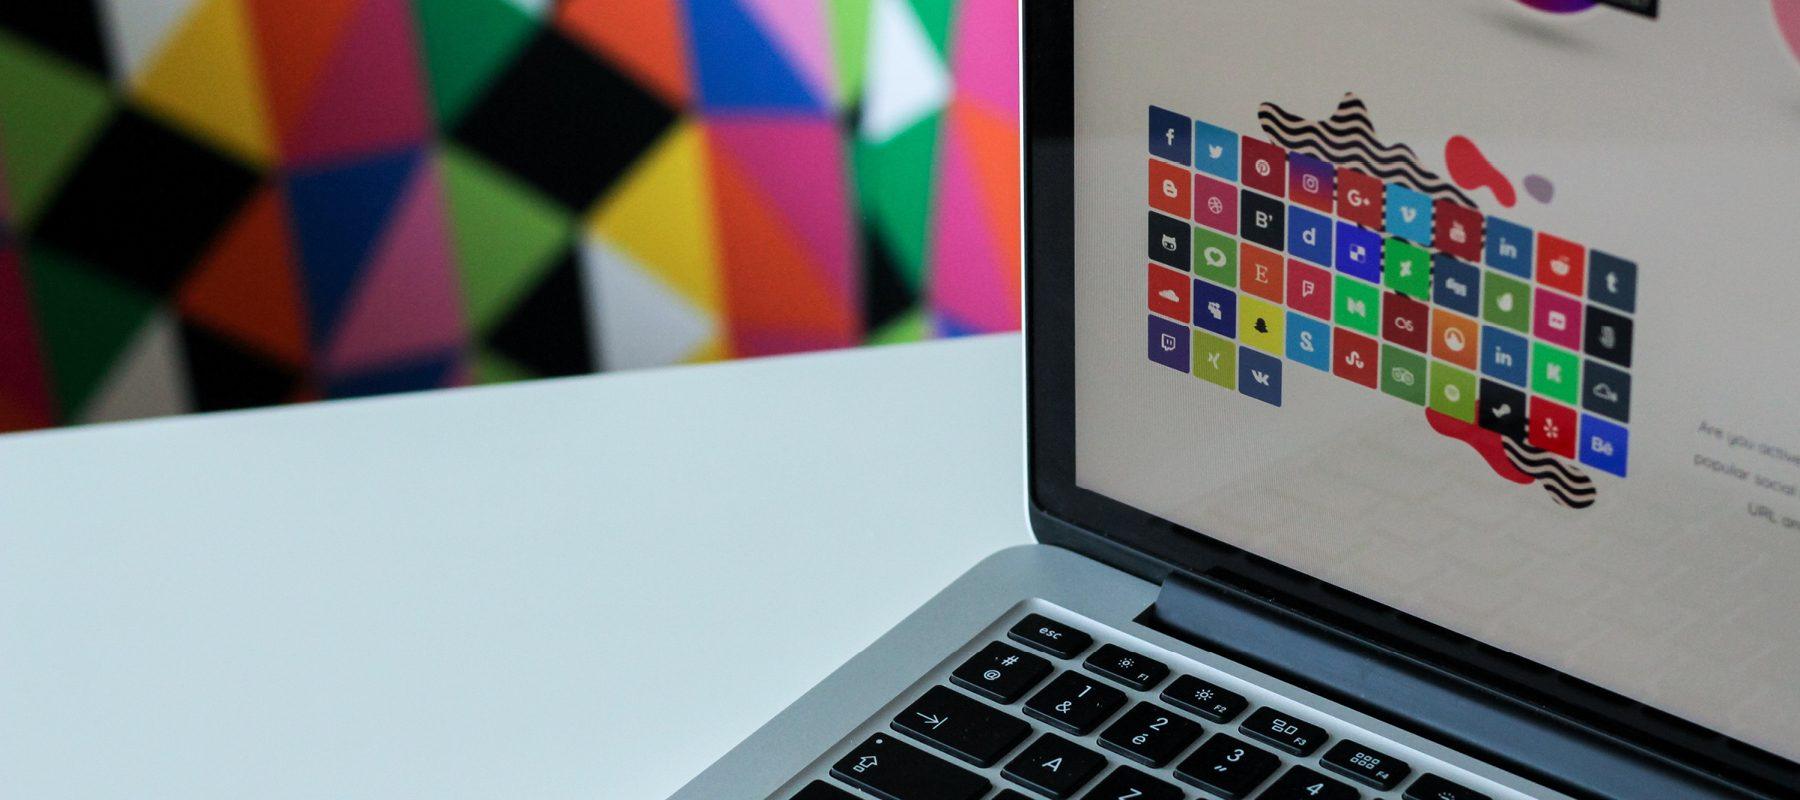 web design development laptop mockup